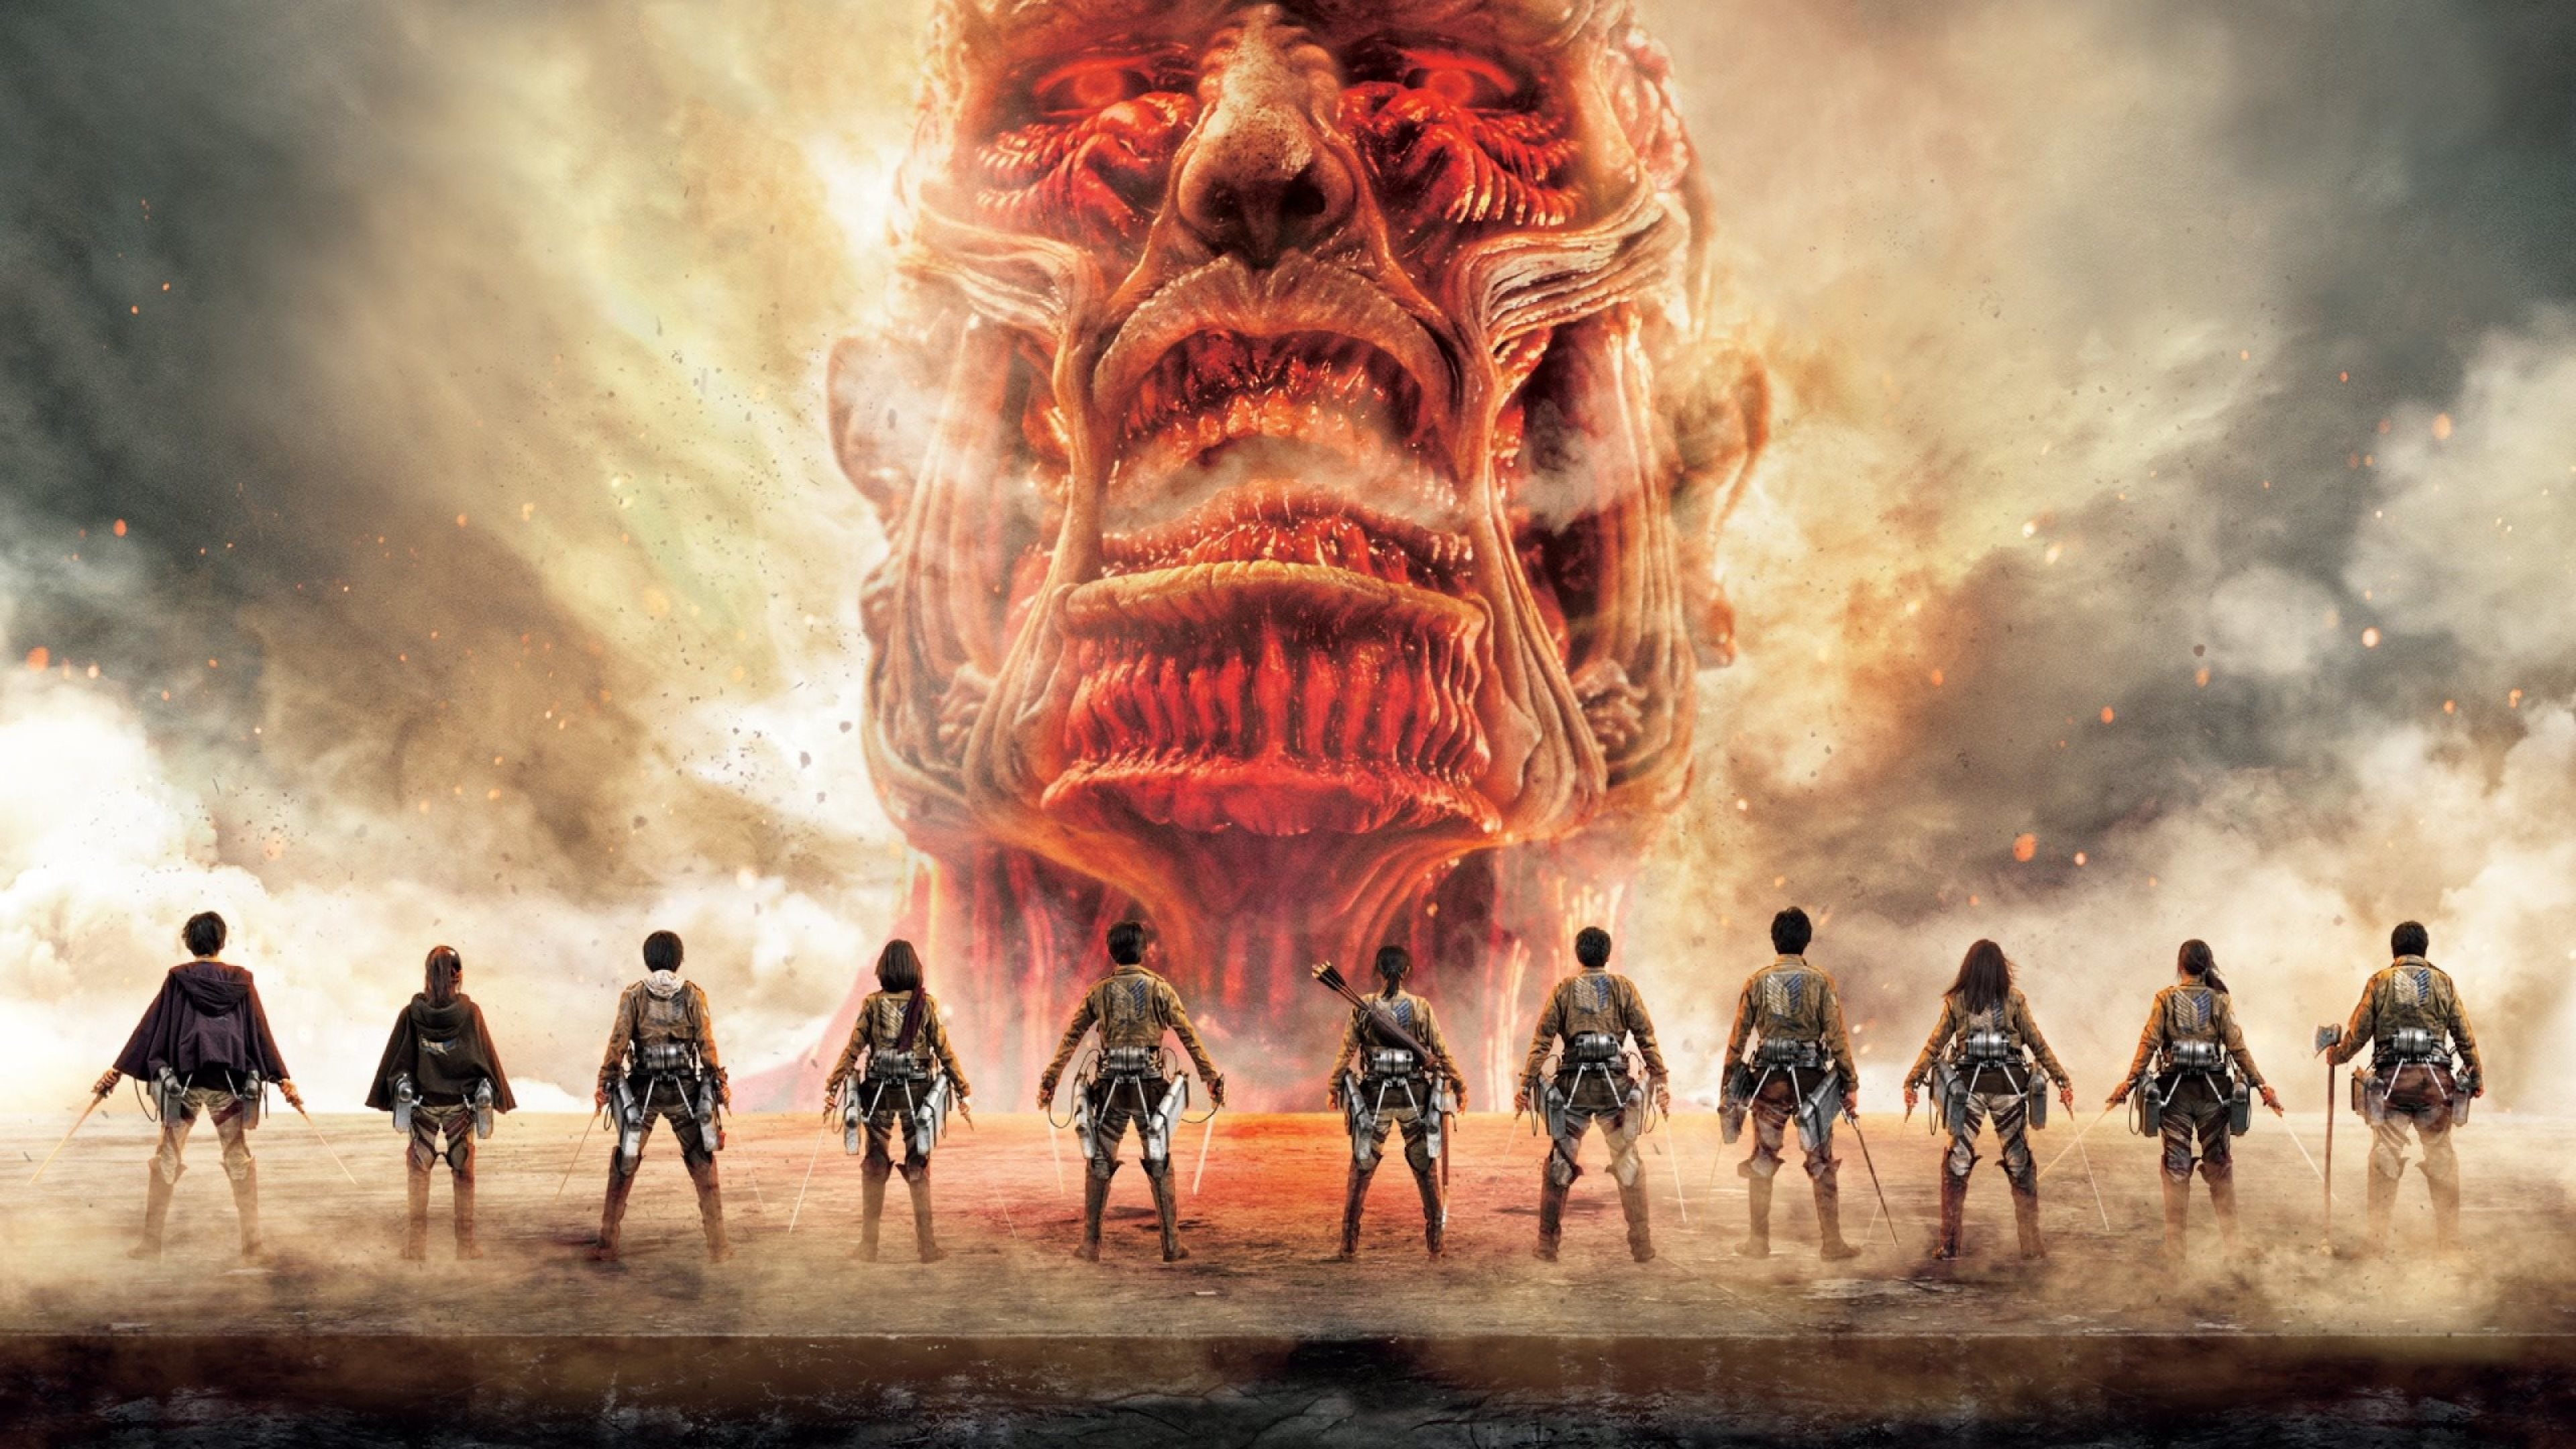 Angelanne: Attack On Titan Wallpaper Hd For Laptop